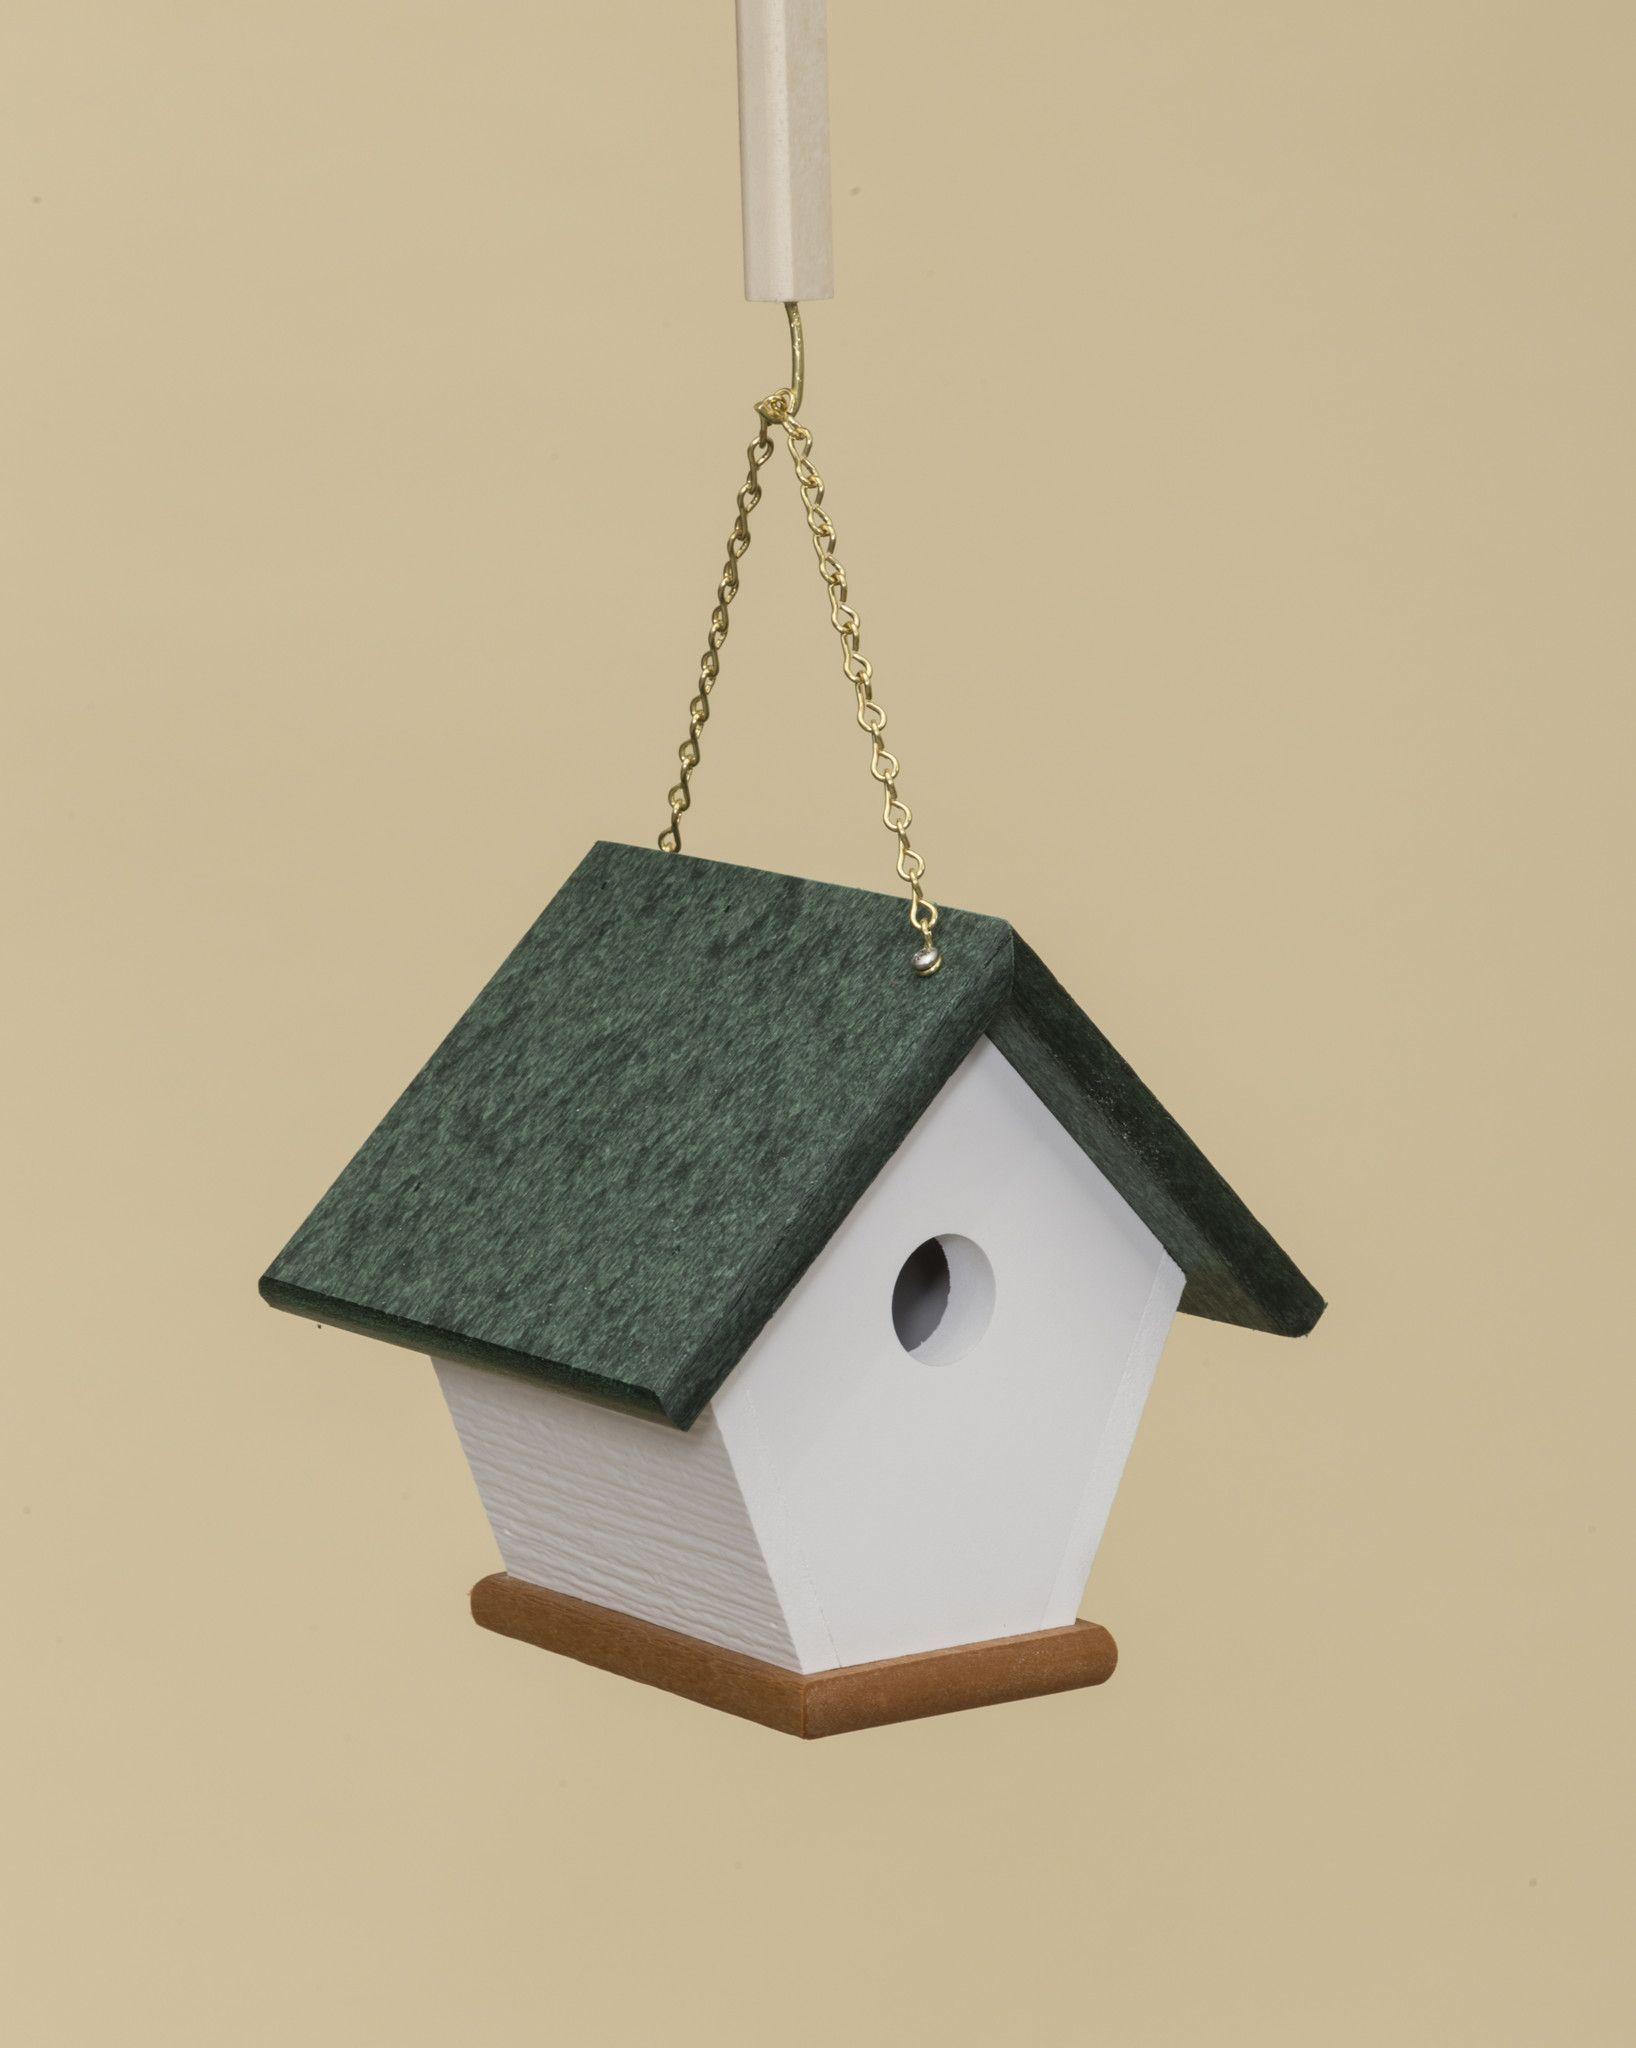 WREN BIRD HOUSE Amish Handmade Weatherproof